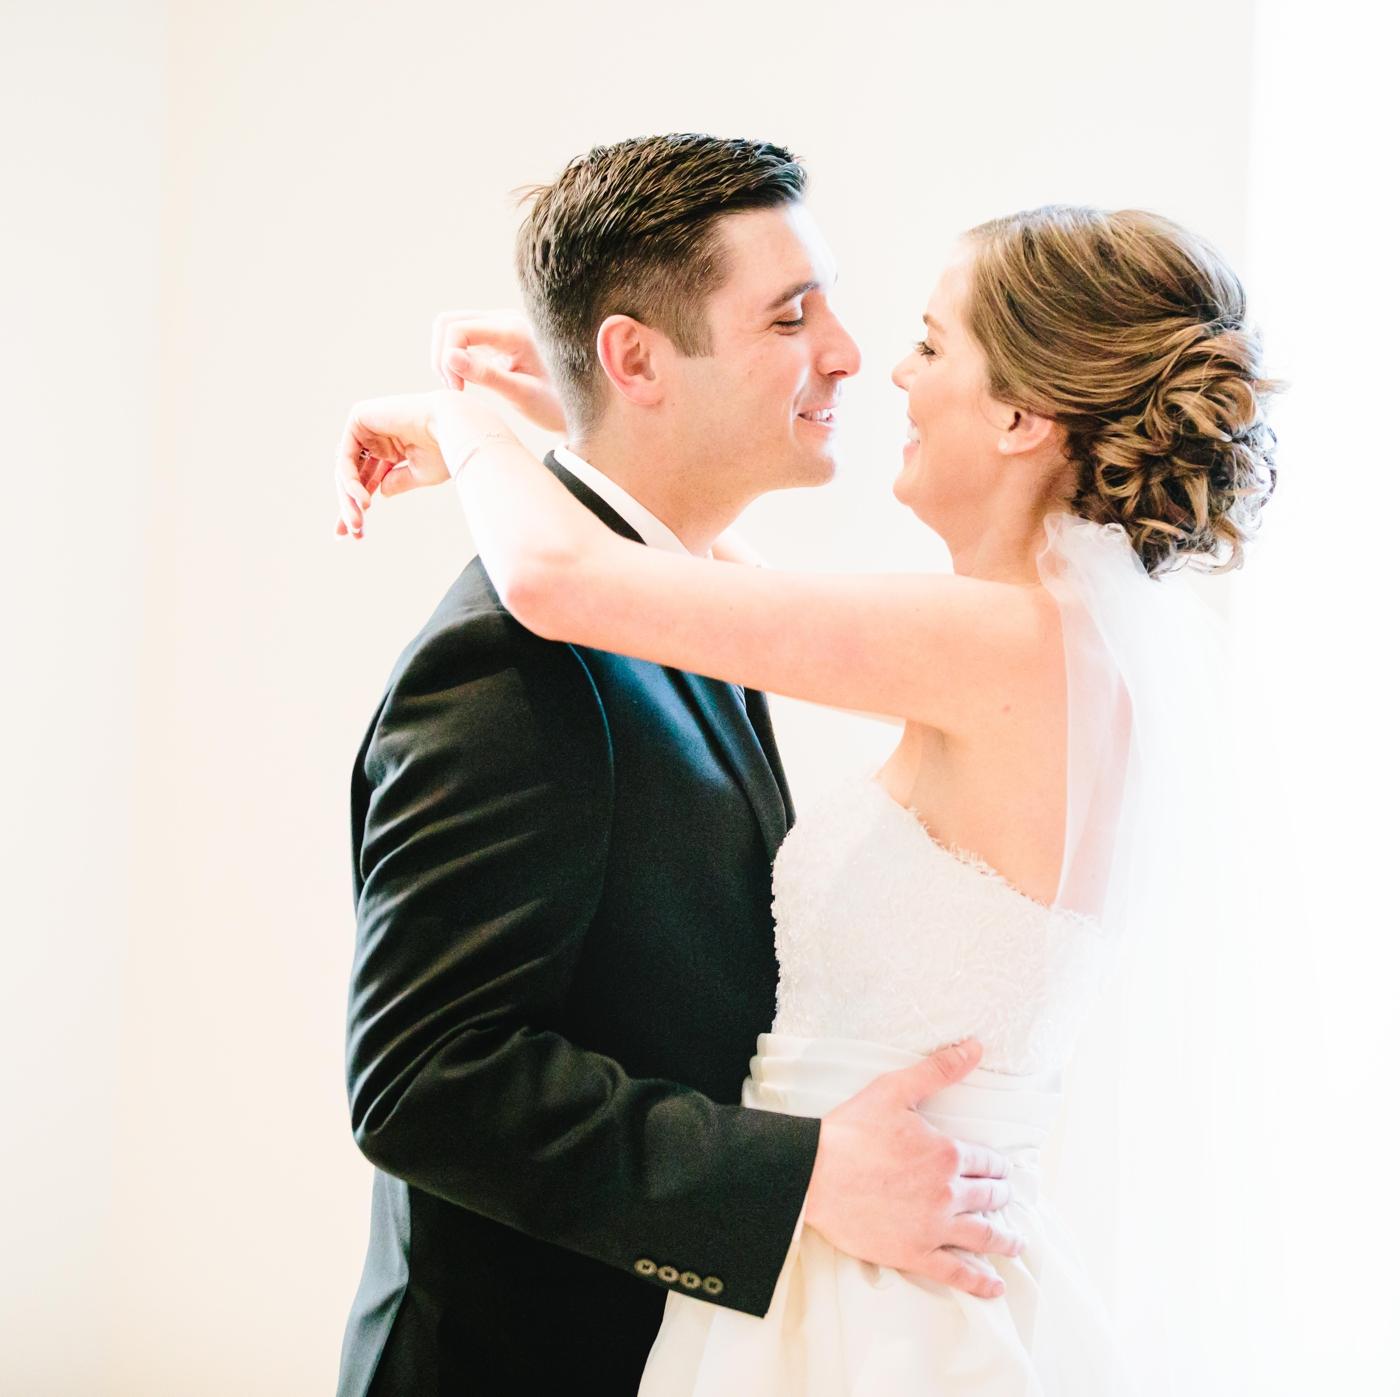 chicago-fine-art-wedding-photography-blais53